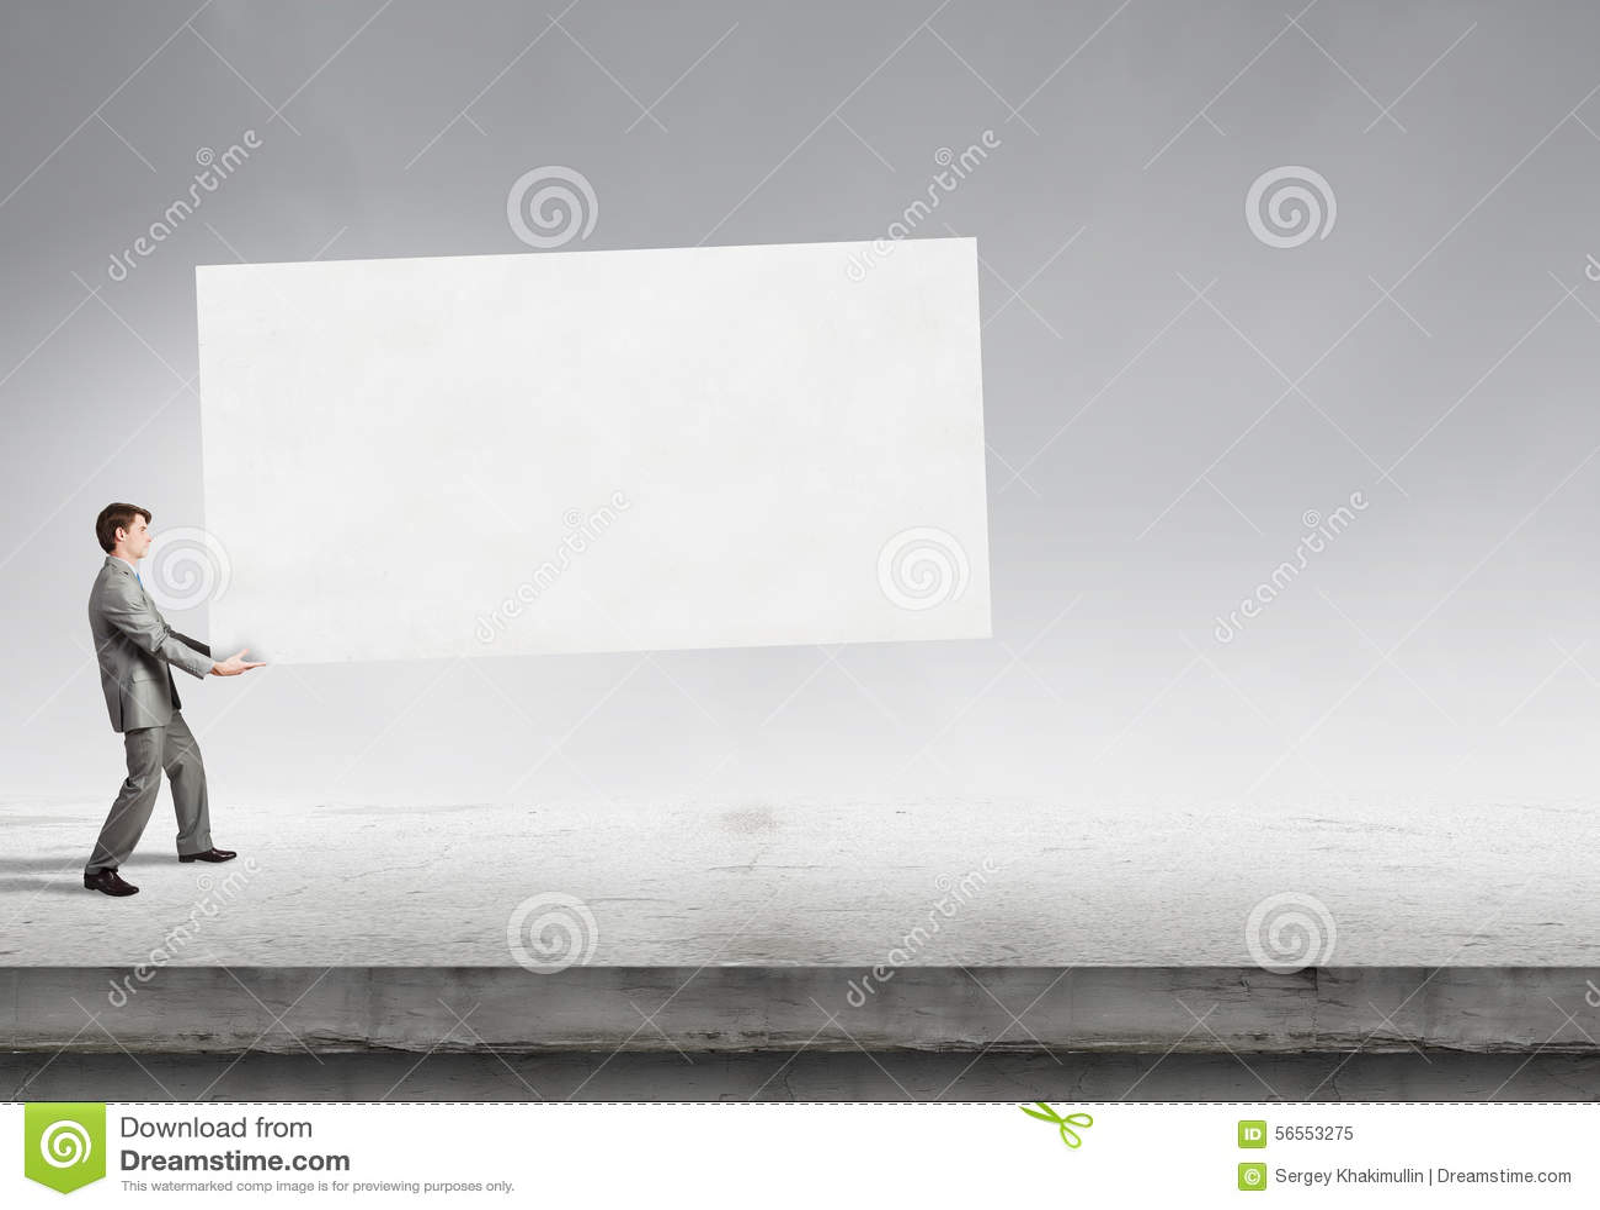 Download Έμβλημα για τη διαφήμισή σας Στοκ Εικόνα - εικόνα από ήπια, φορτίο: 56553275